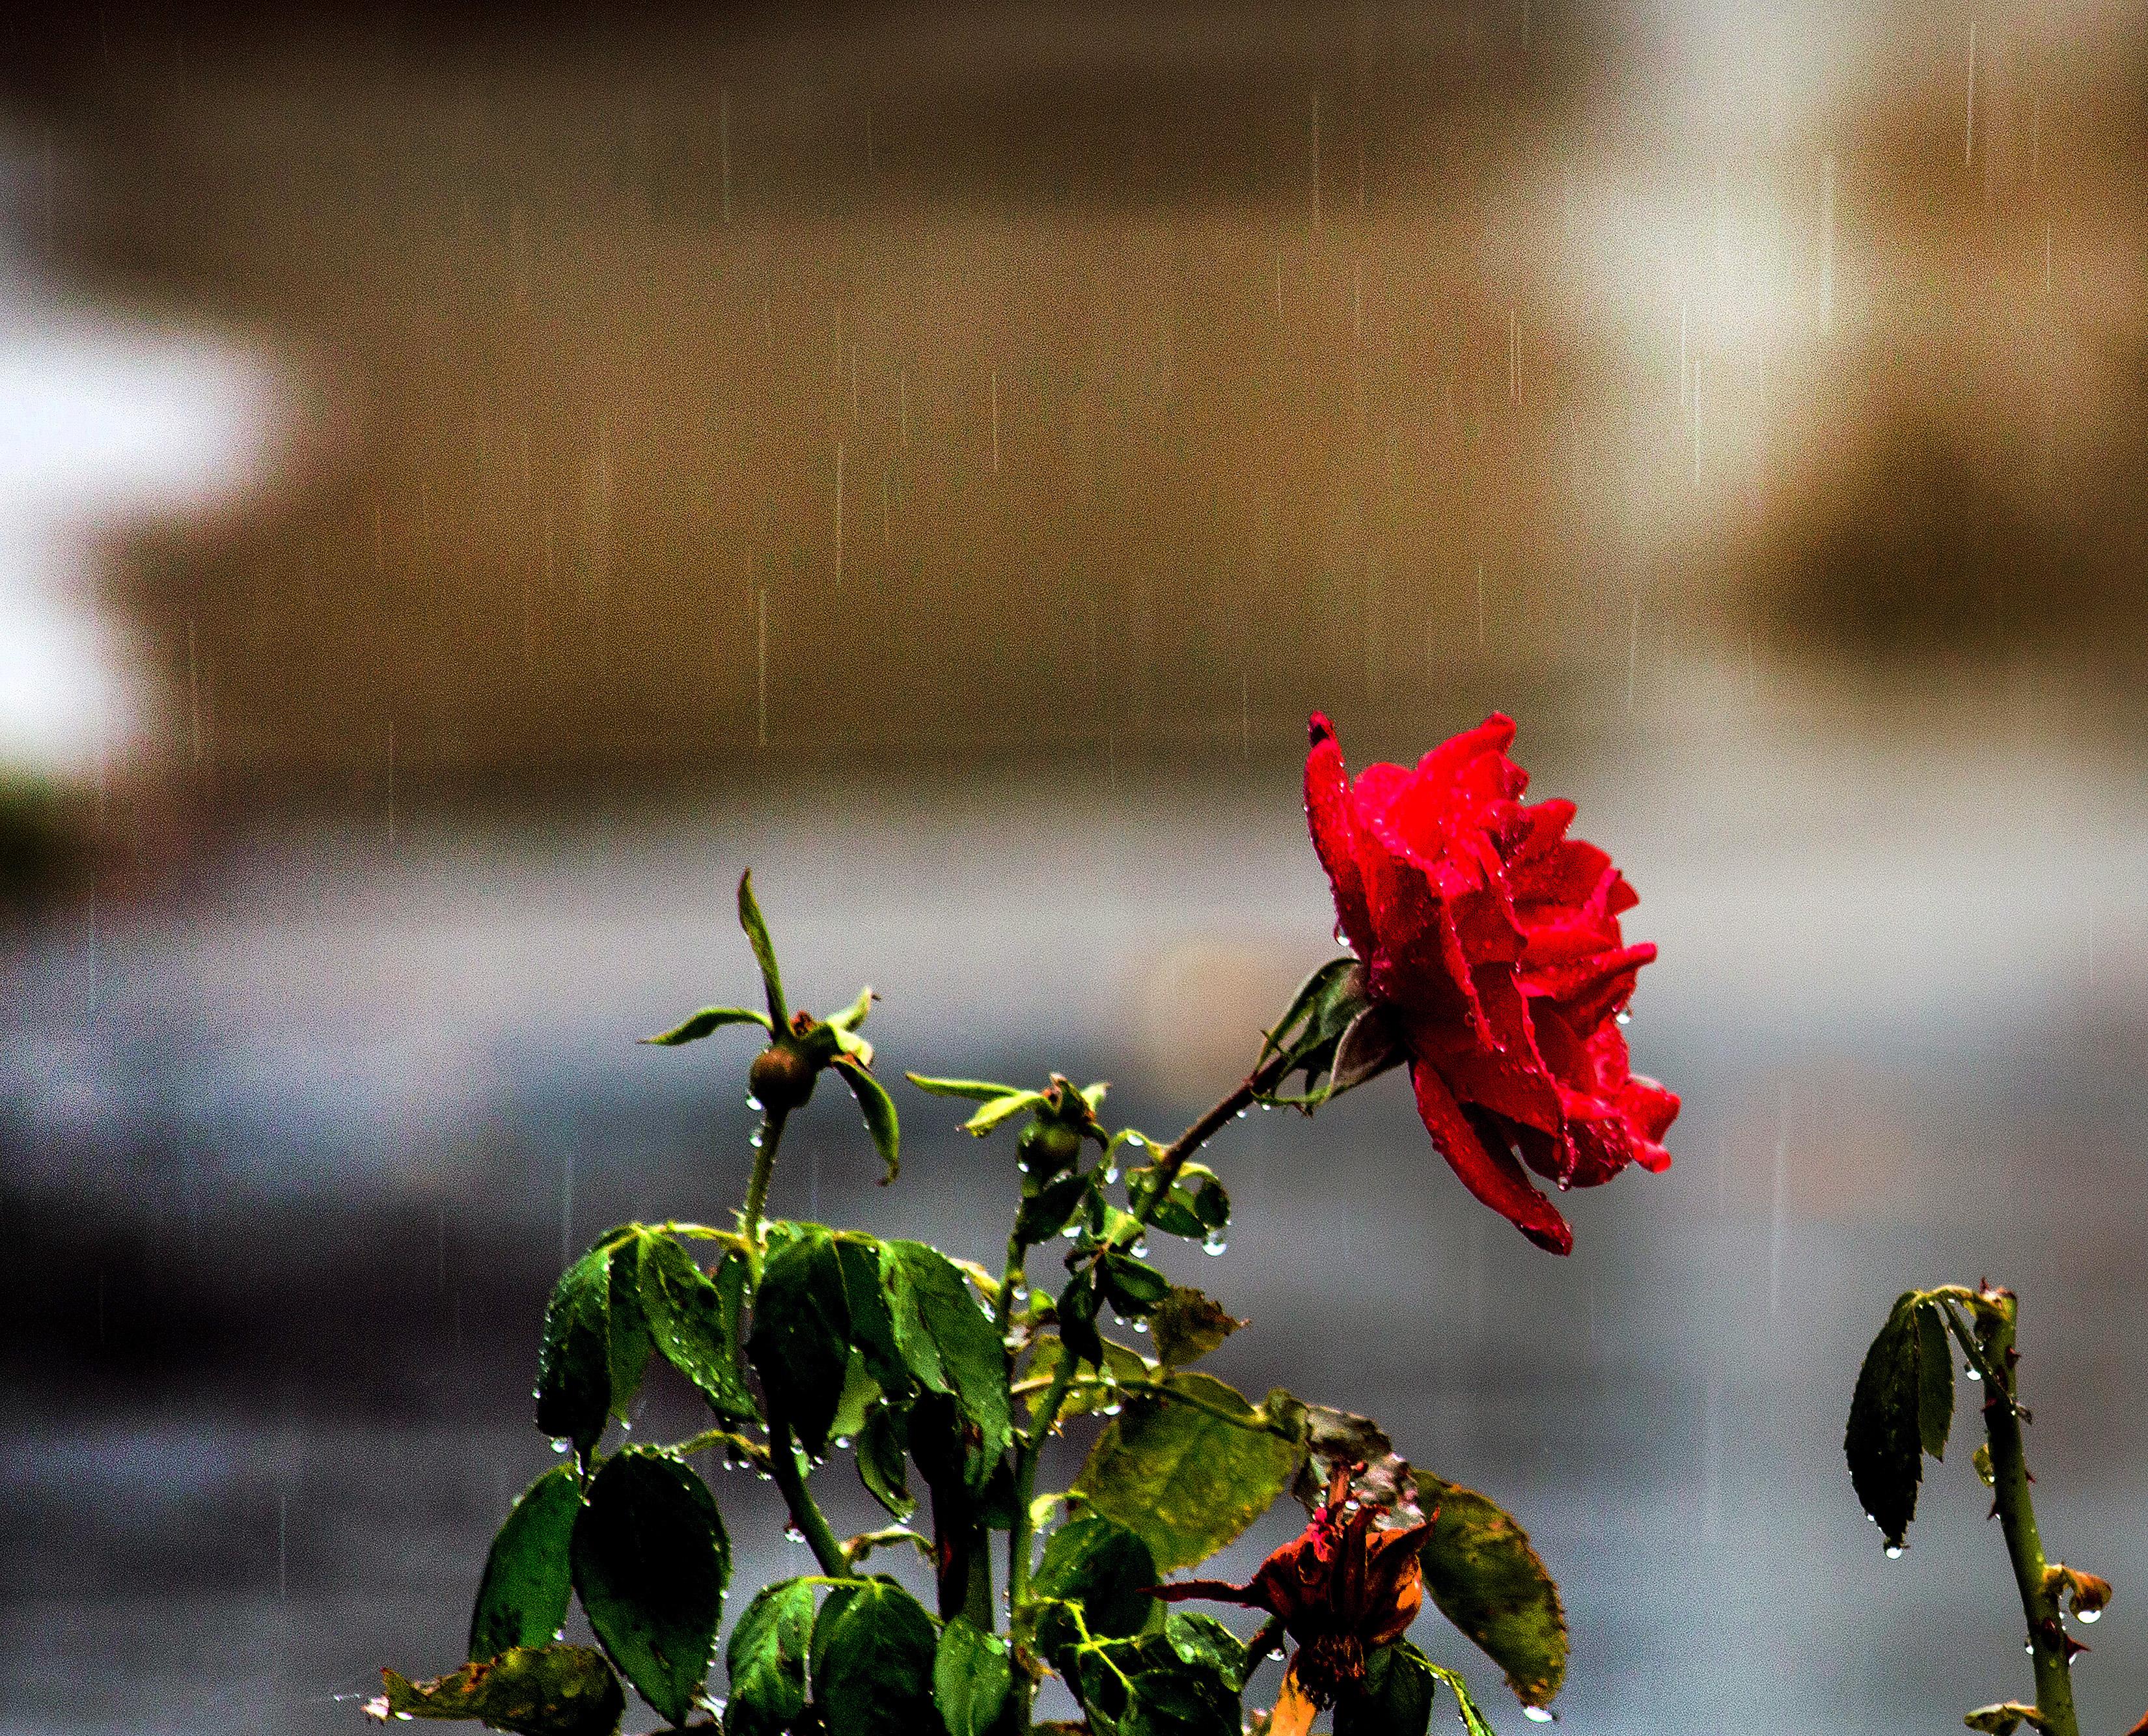 Gambar Alam Mekar Menanam Sinar Matahari Hujan Daun Bunga Mawar Hijau Refleksi Merah Warna Musim Gugur Cuaca Botani Flora Merapatkan Fotografi Makro Batang Tanaman 3300x2667 282682 Galeri Foto Pxhere